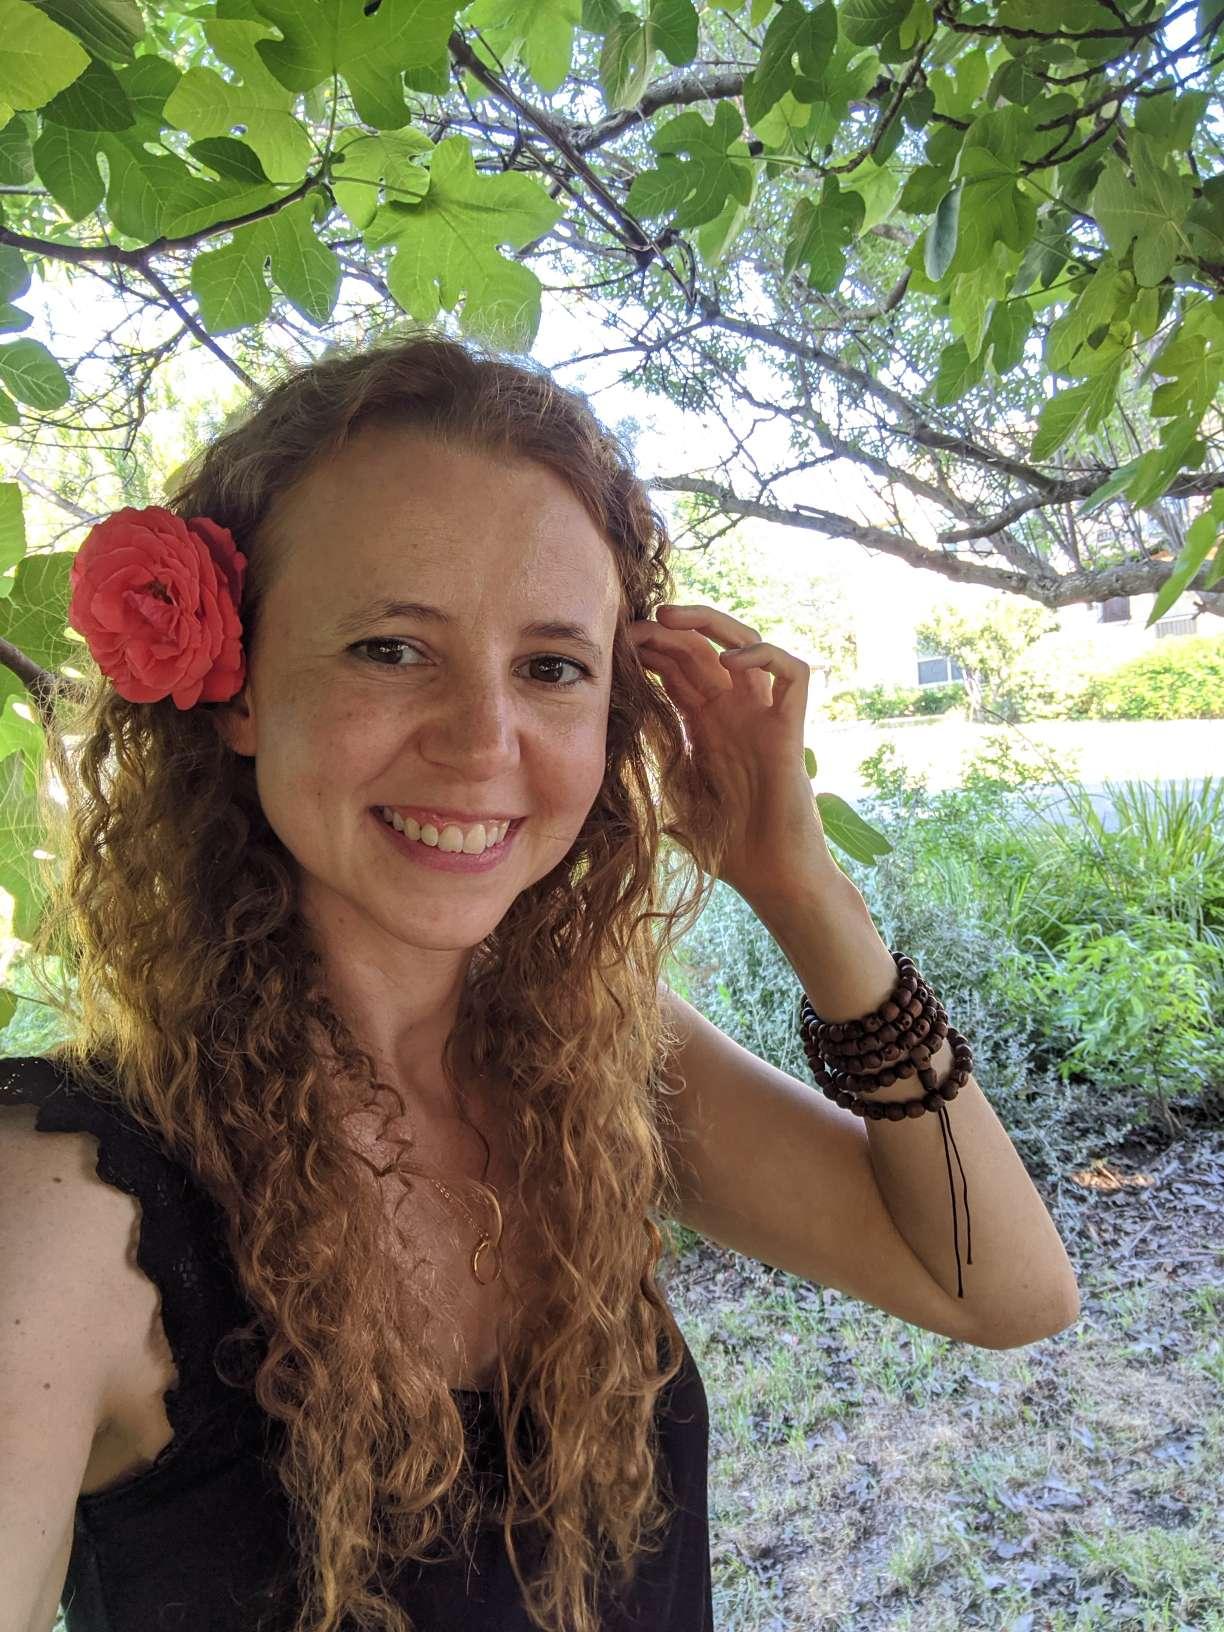 Katie shoaf's profile image